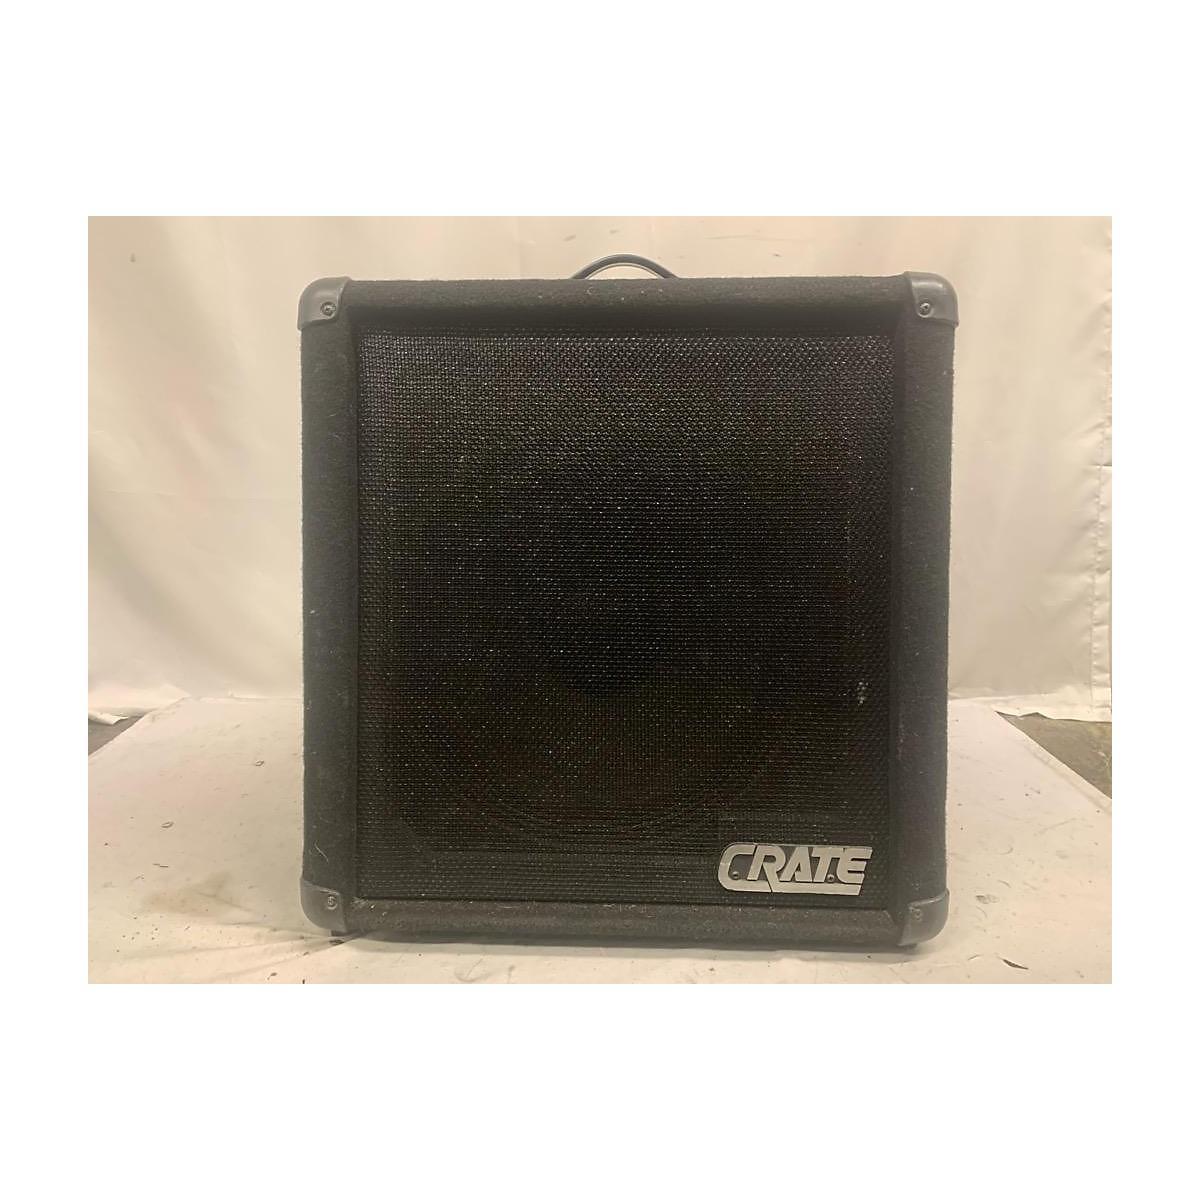 Crate Kx220 Powered Speaker